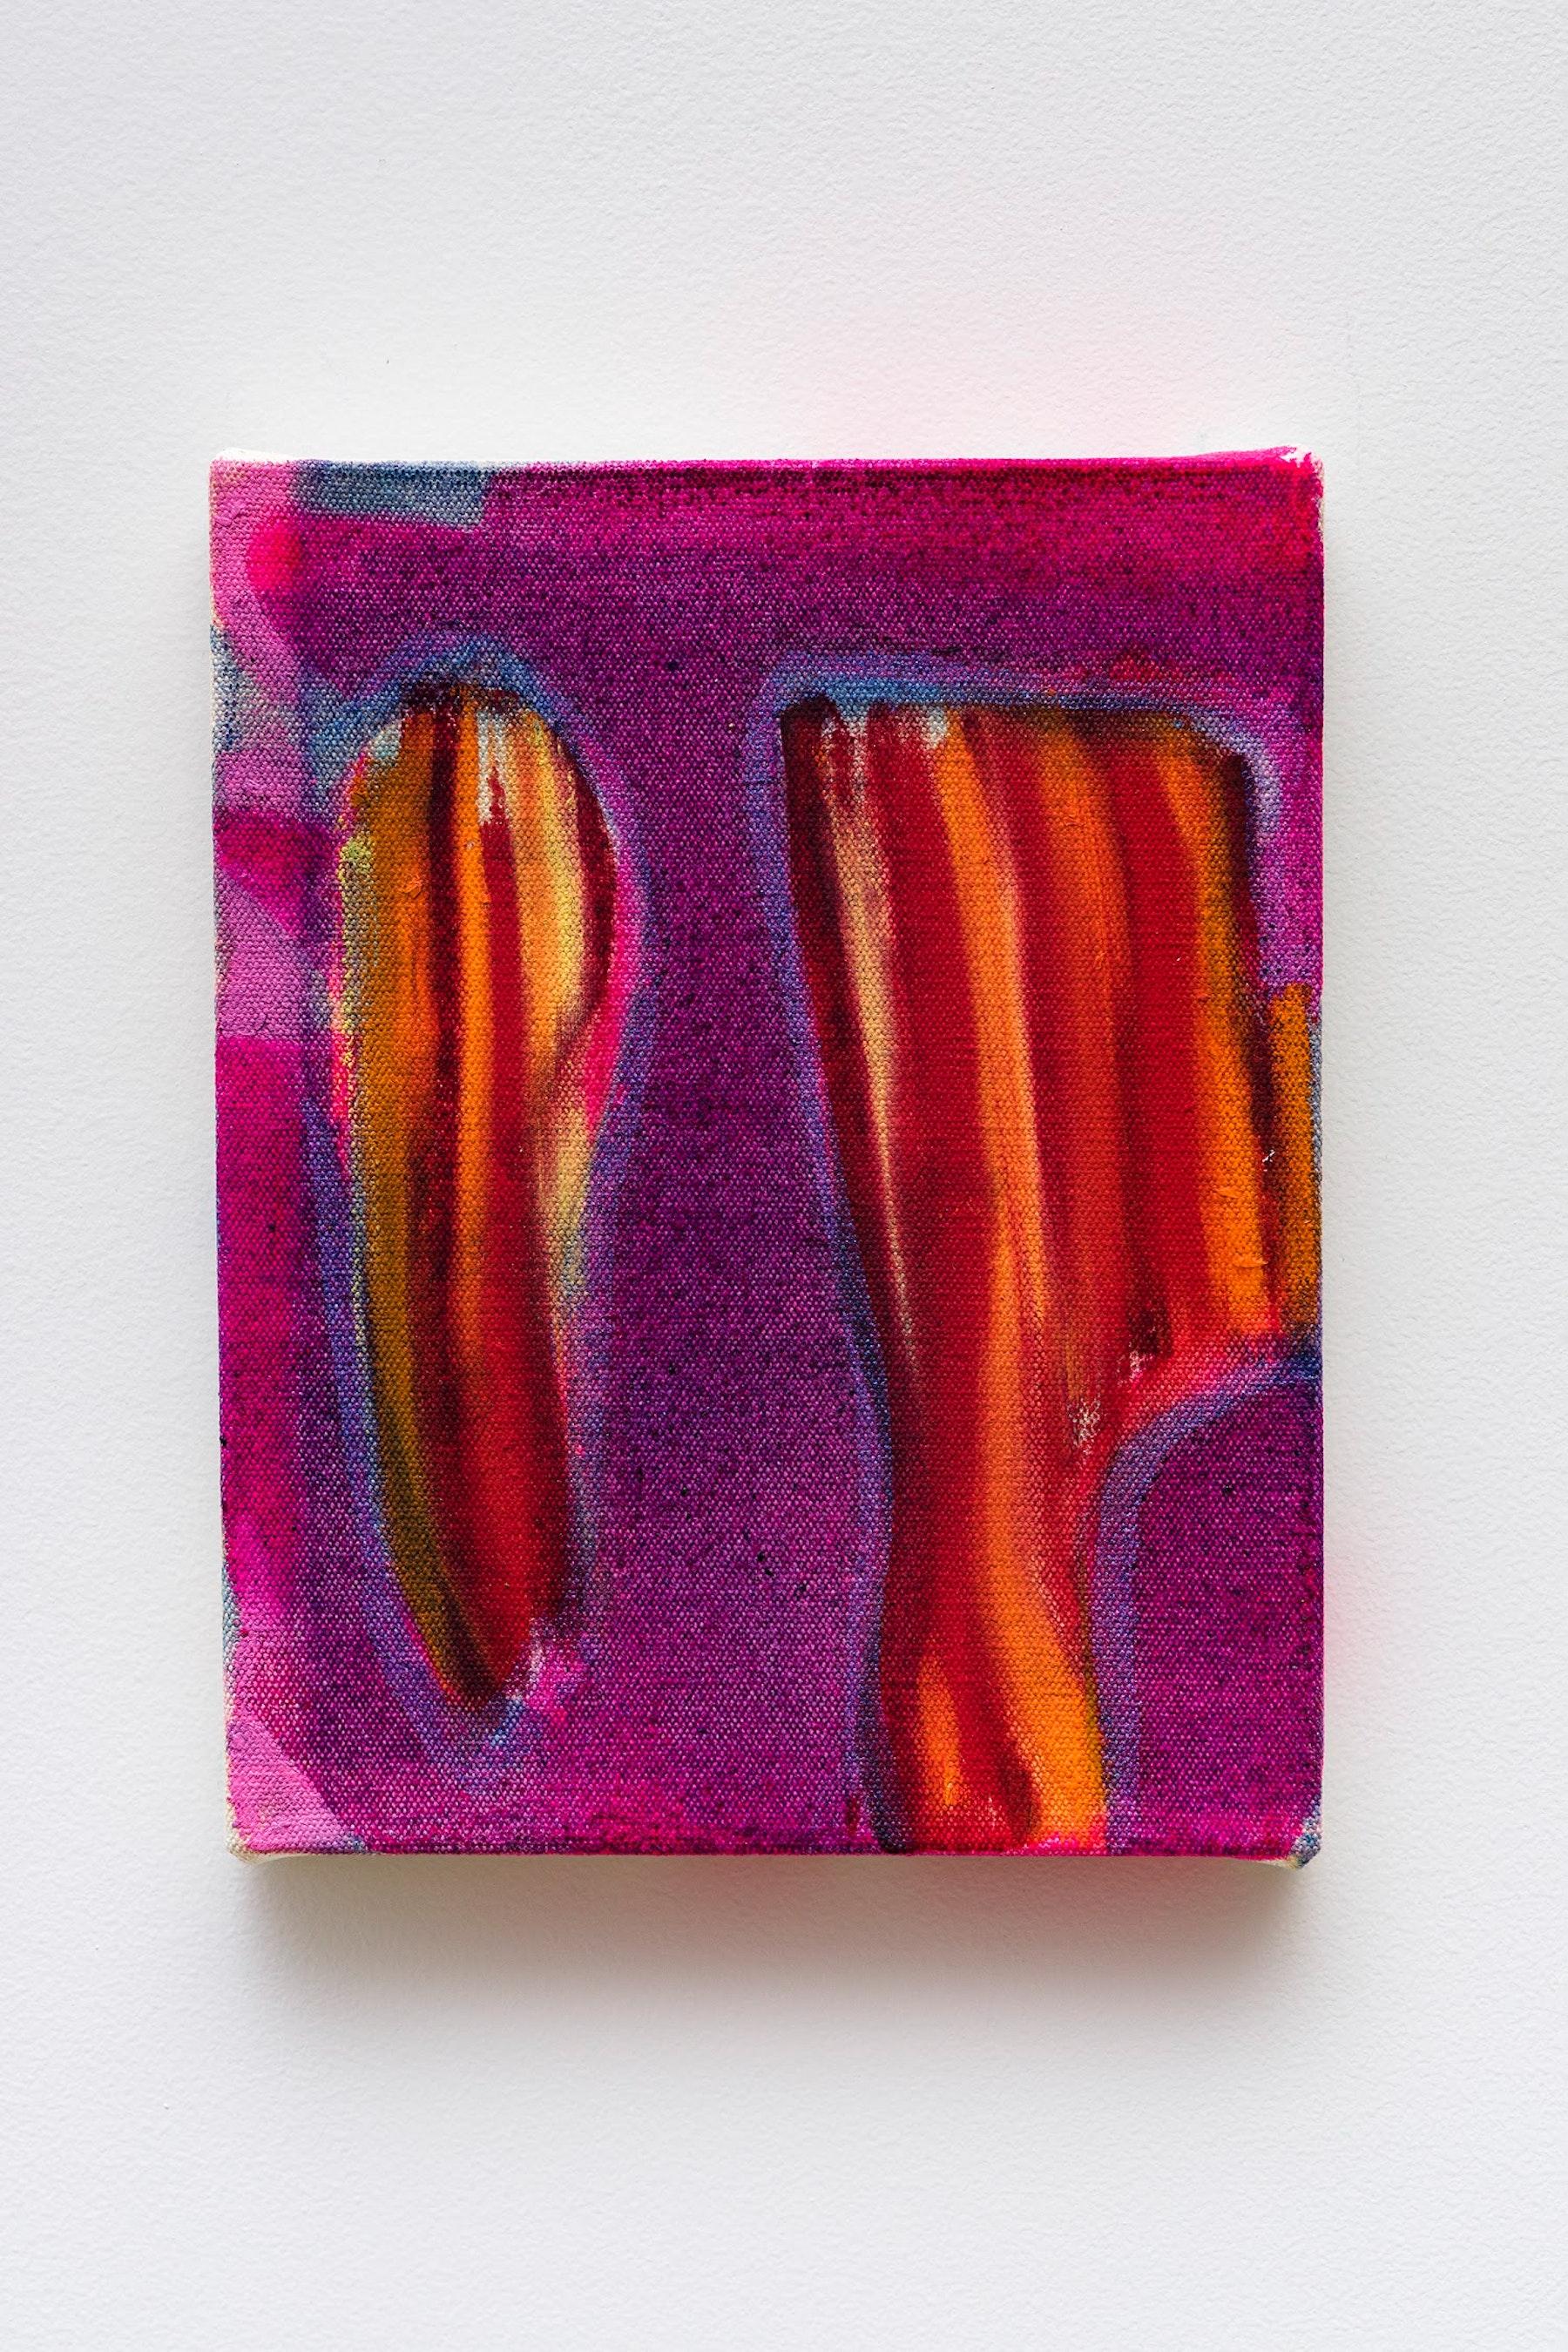 "Monique Van Genderen ""Untitled,"" 2020 Oil on canvas 10 x 8"" [HxW] (25.4 x 20.32 cm) Inventory #VGE394 Courtesy of the artist and Vielmetter Los Angeles Photo credit: Jeff Mclane"